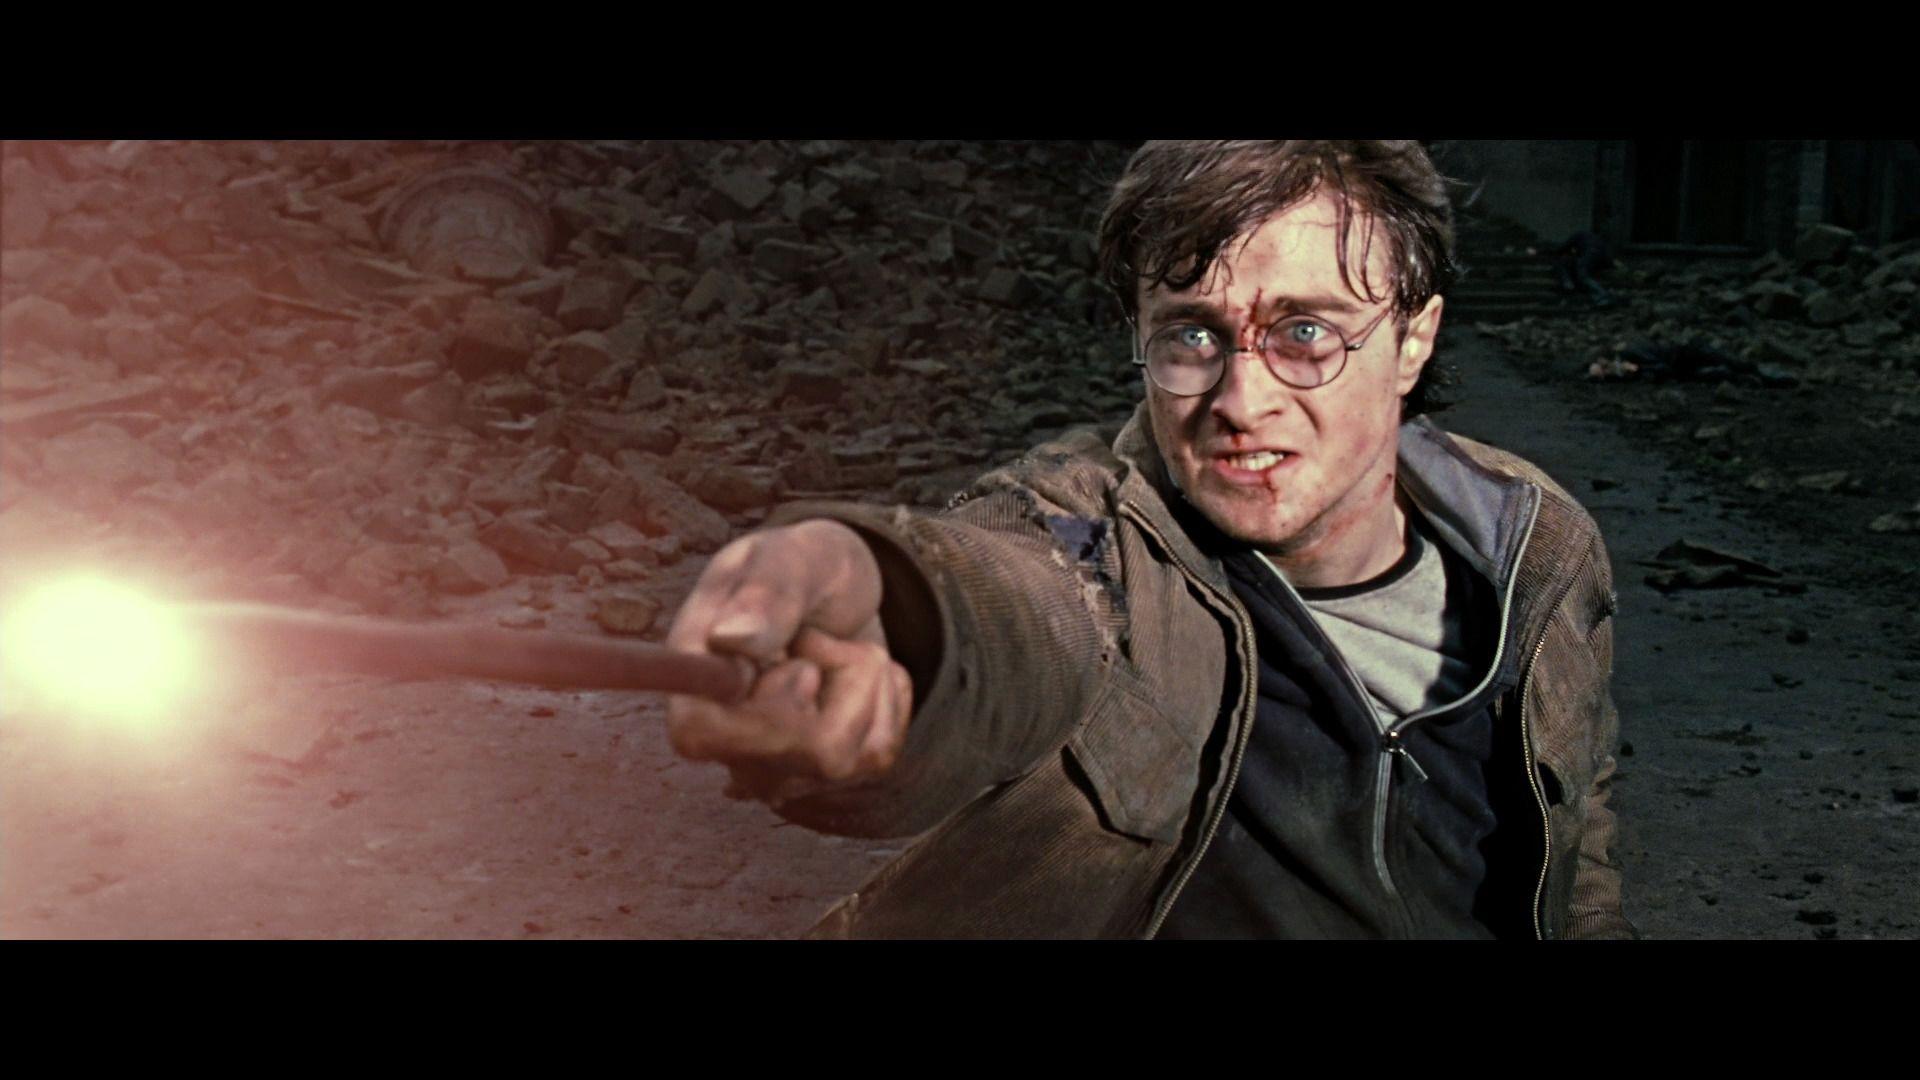 Pin By Manuel Axel Cruz On Fondos De Pantalla Harry Potter Harry Potter Deathly Hallows Part 2 Movies